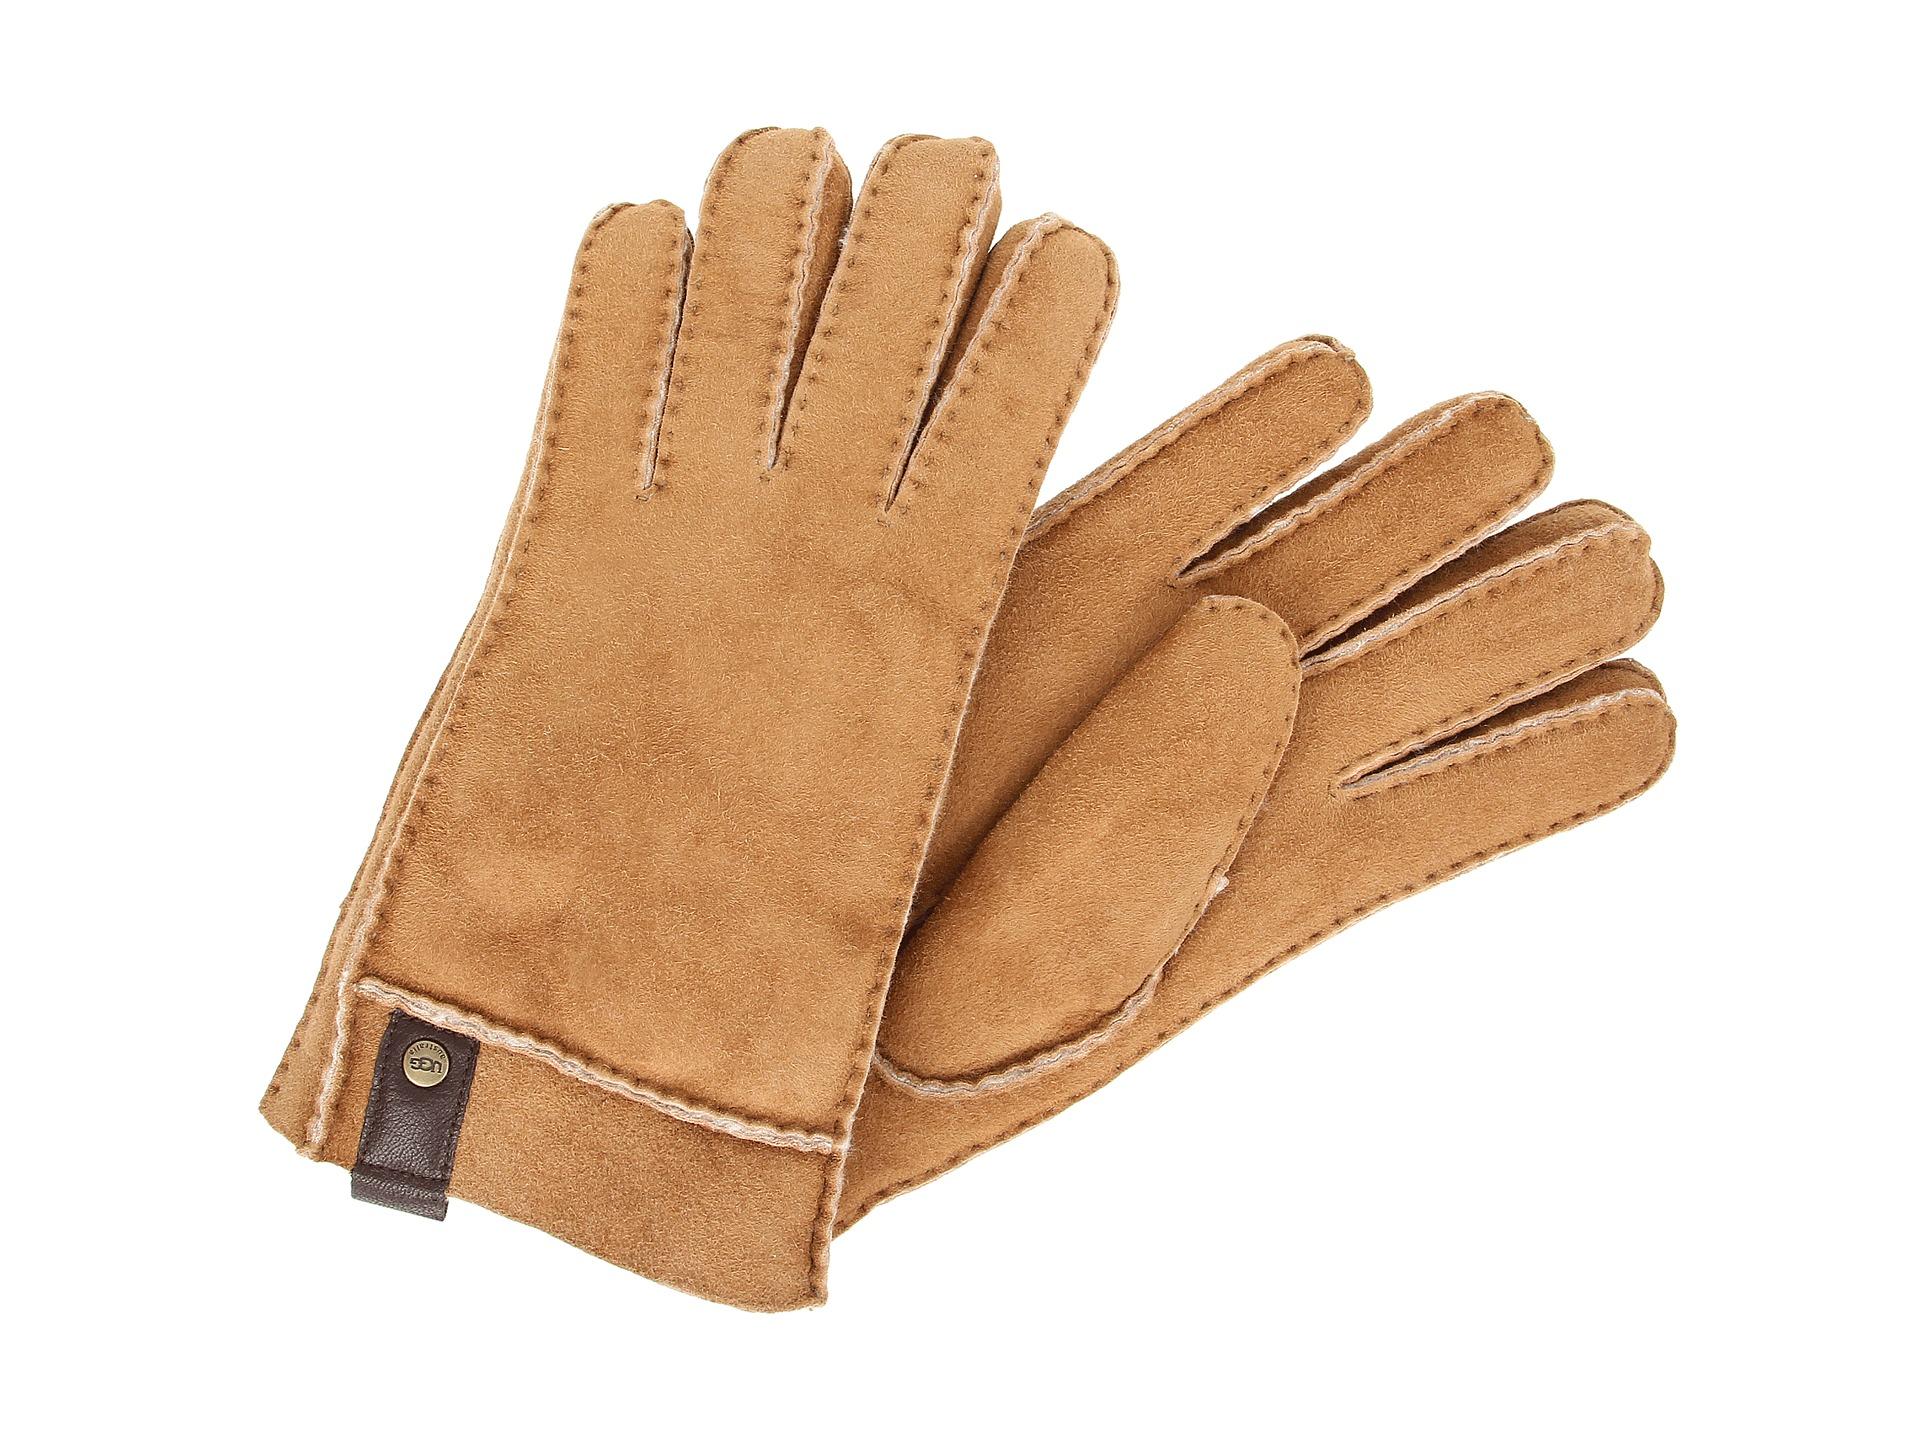 3174ad6318e Ugg Mens Shearling Gloves - cheap watches mgc-gas.com